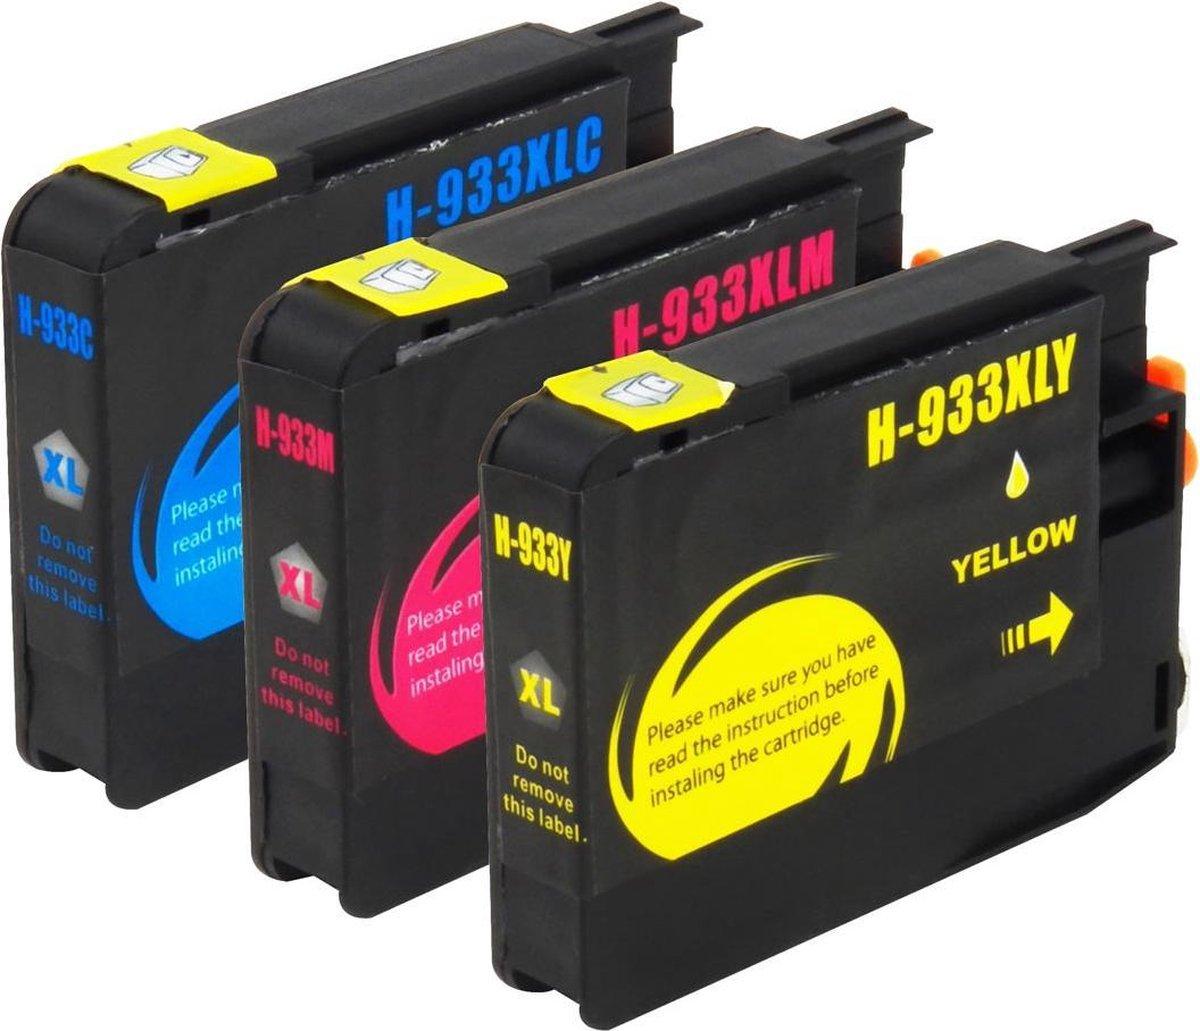 Huismerk HP 932 / HP 933 XL inktcartridges, set van 3 stuks. Cyaan / Magenta / Geel / Hoge Capaciteit - InktMaxx